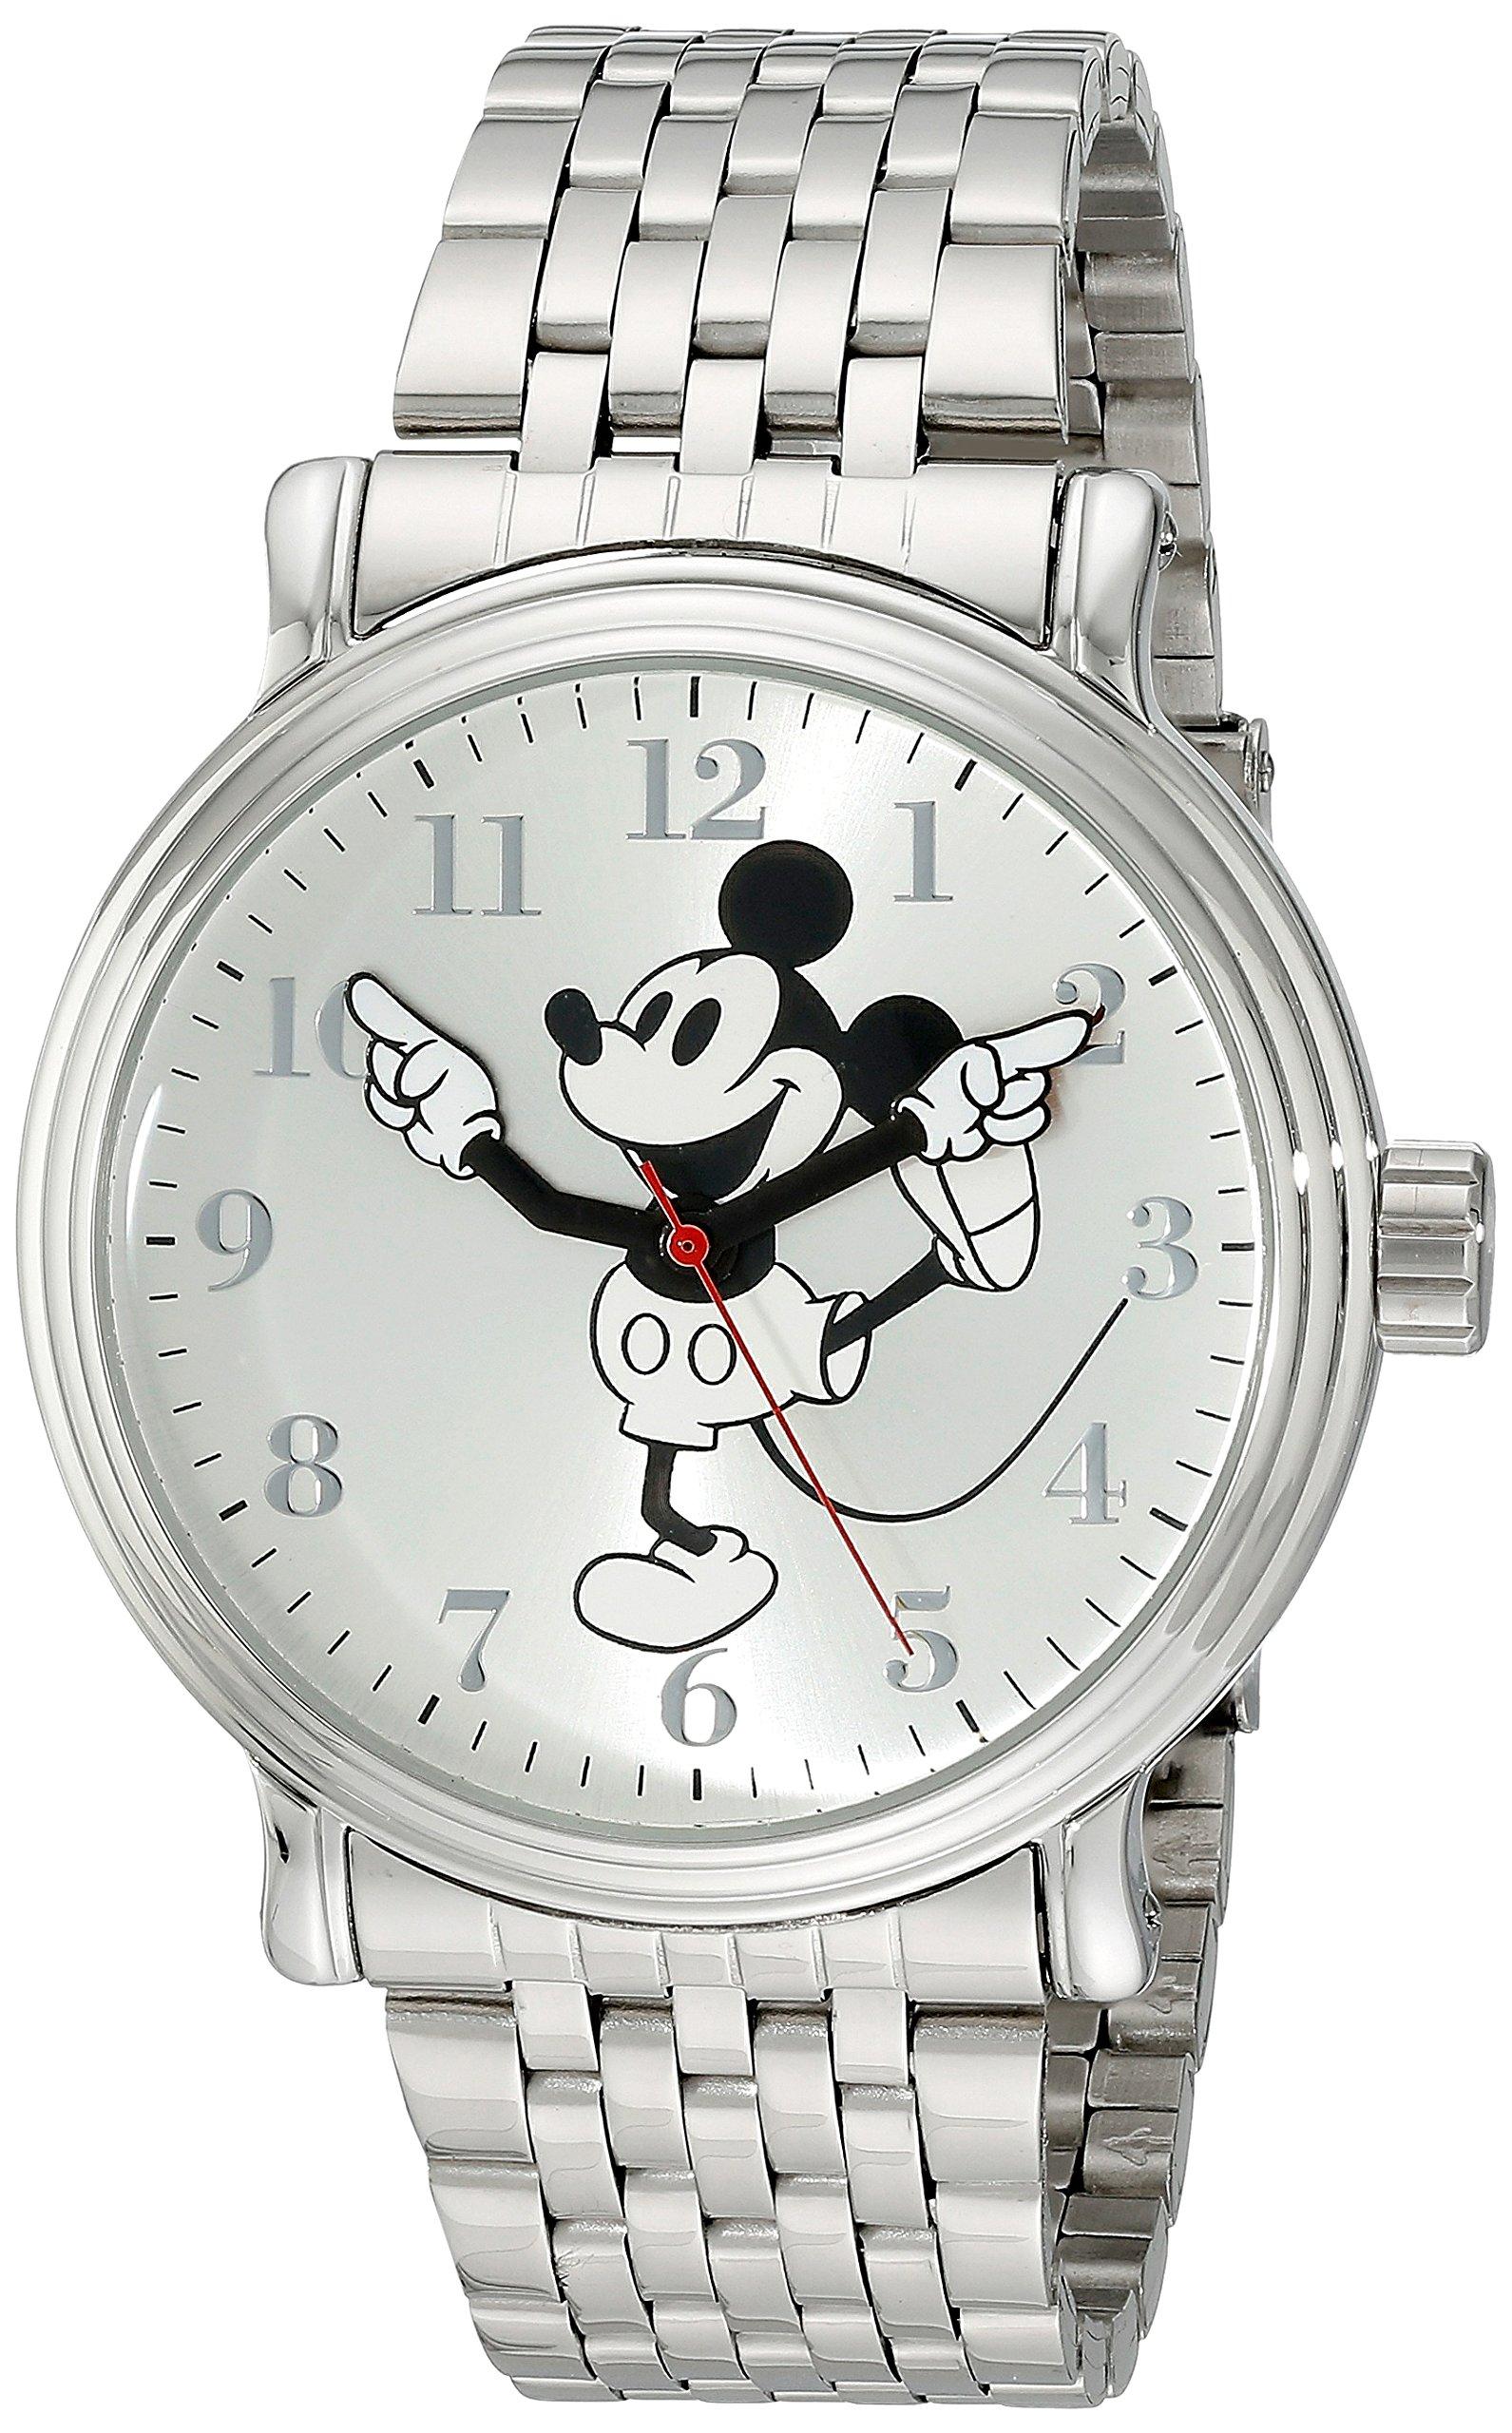 Disney Men's W001863 Mickey Mouse Analog Display Analog Quartz Silver/Black/White Watch